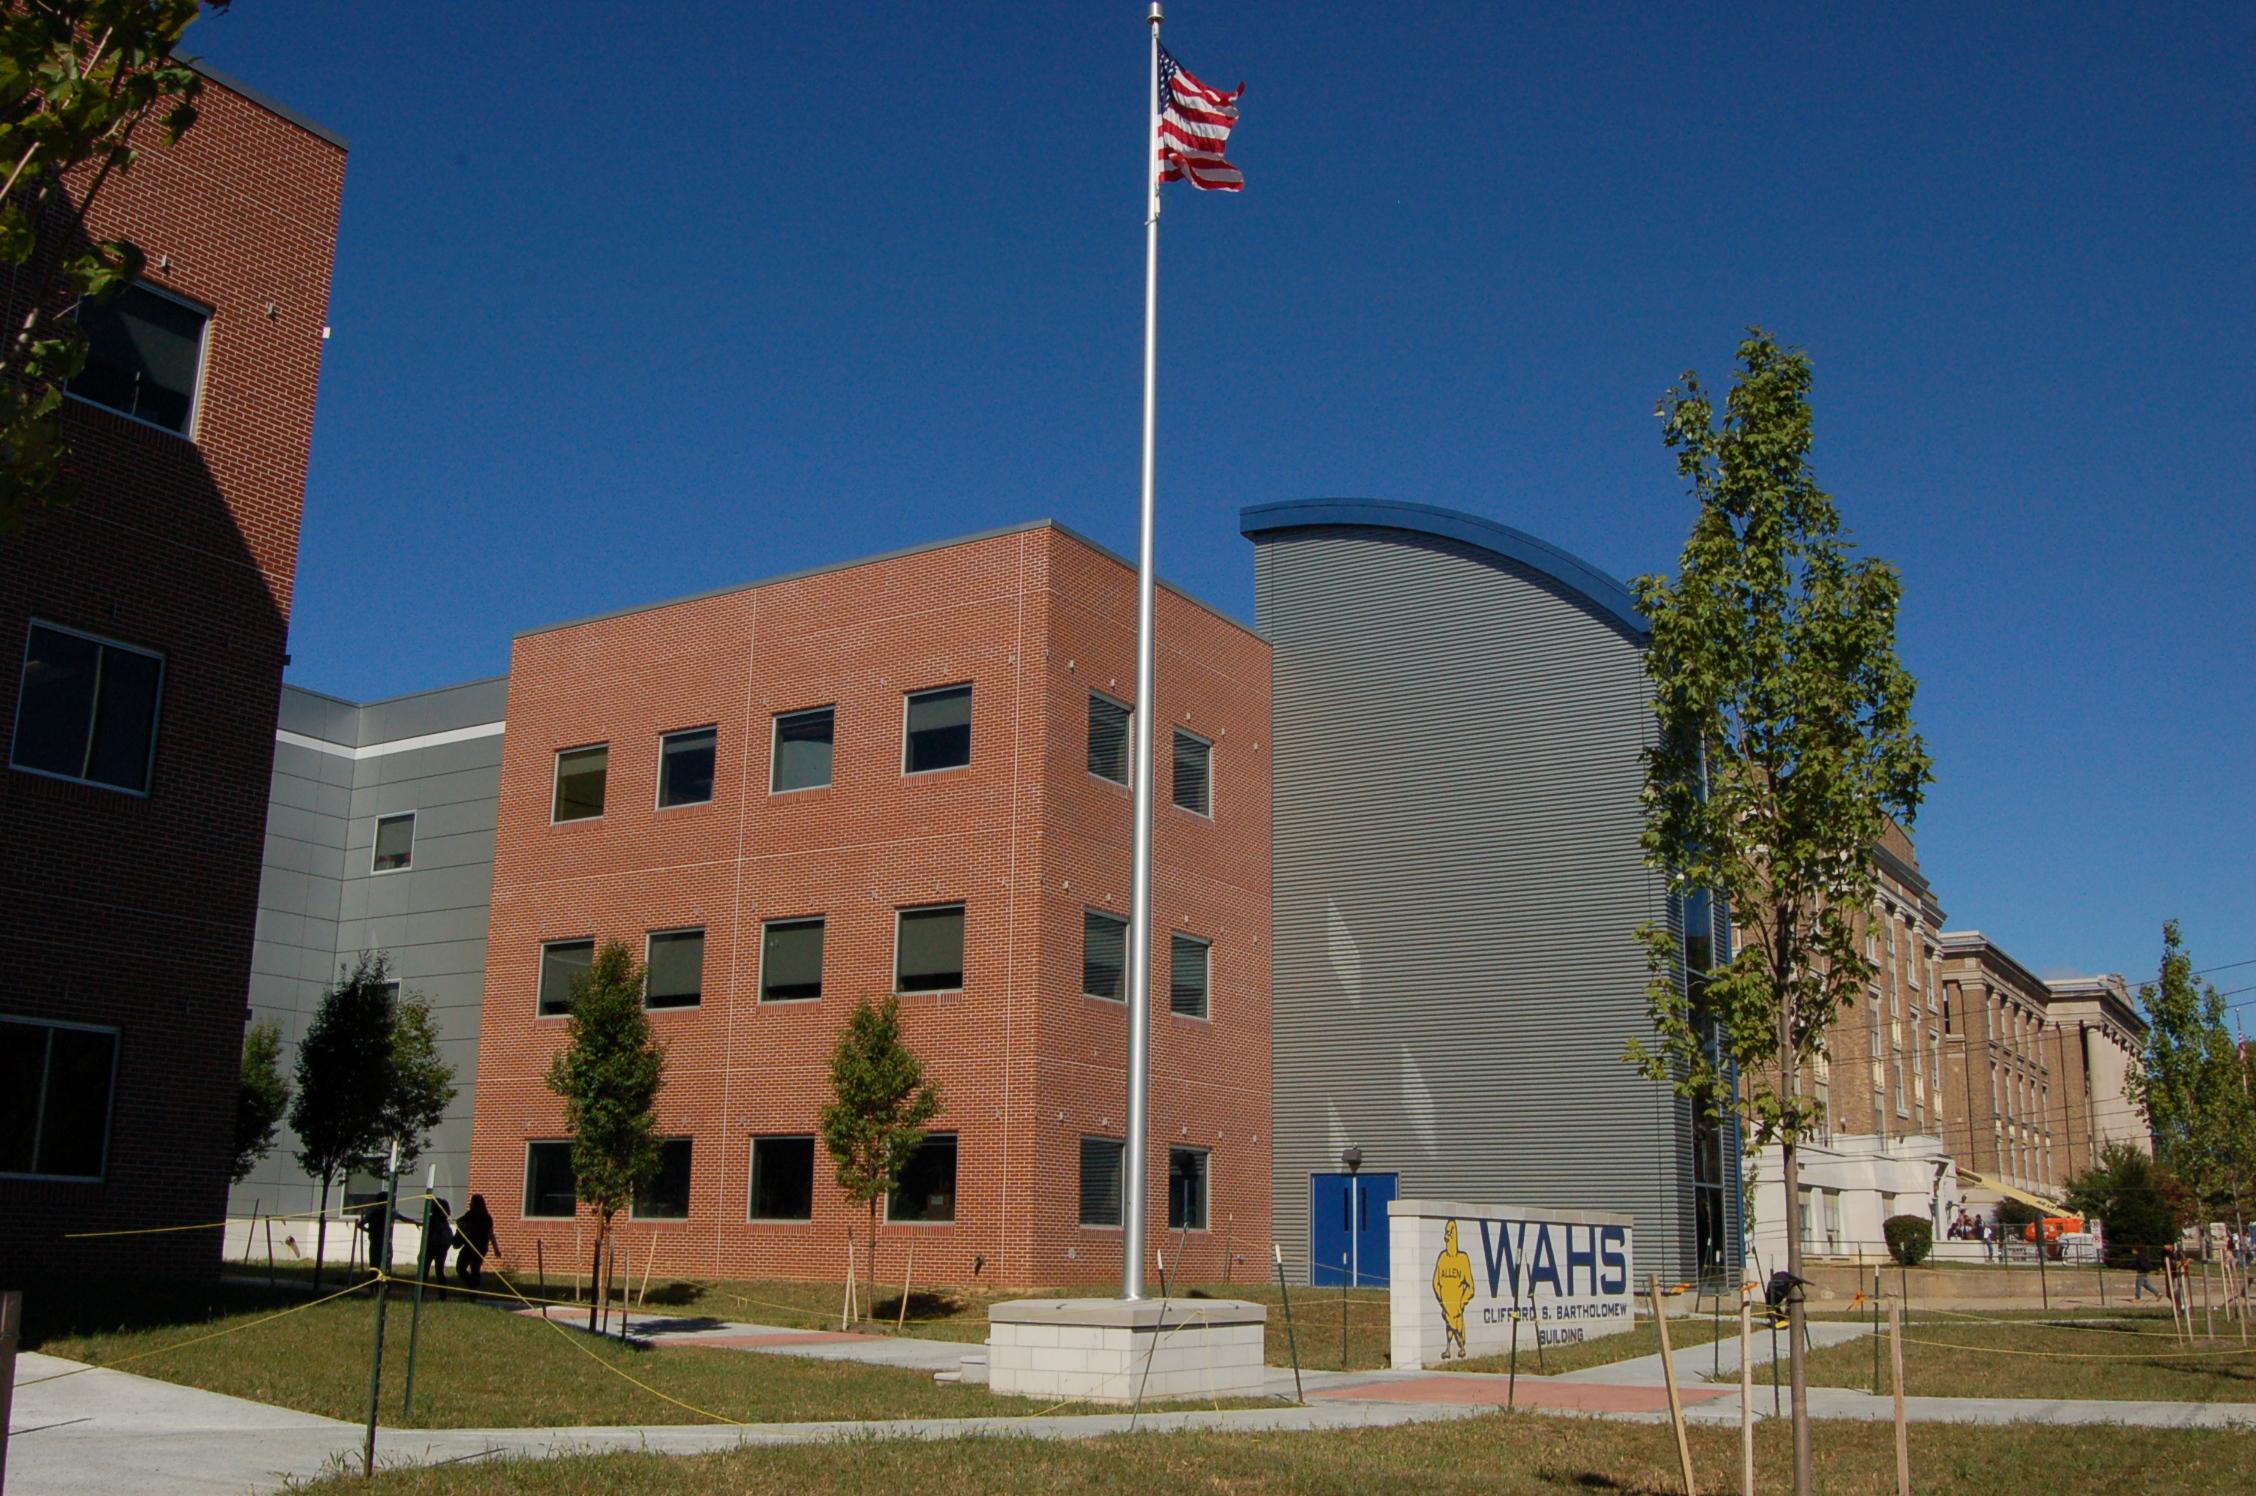 William Allen High School, Allentown School District